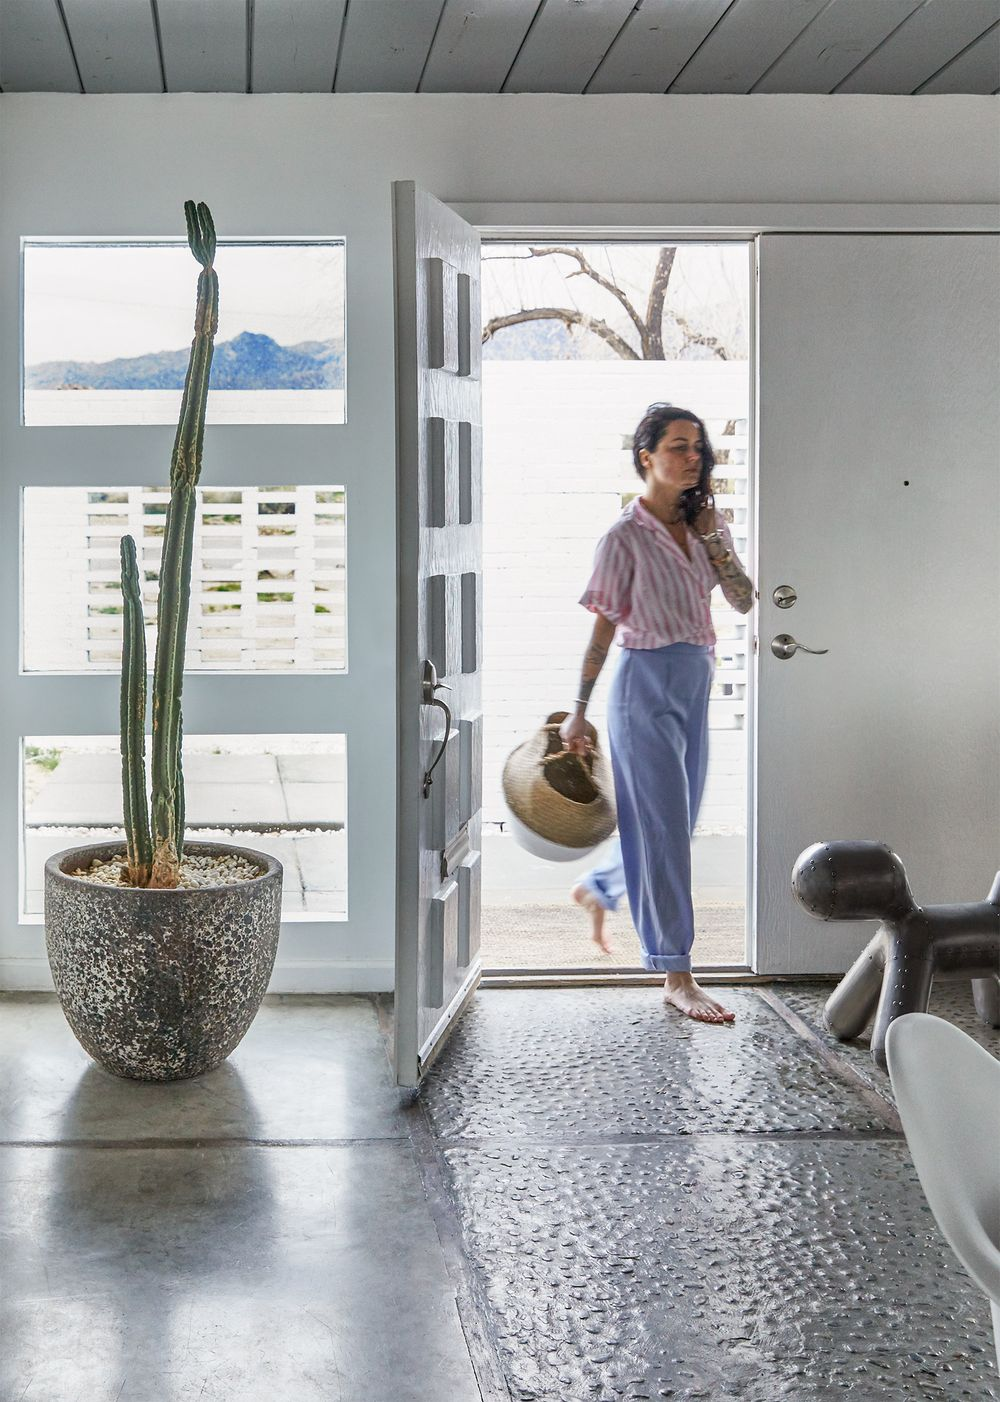 Palm_Springs_Interior-Design-Photography-George-Barberis-12.jpg